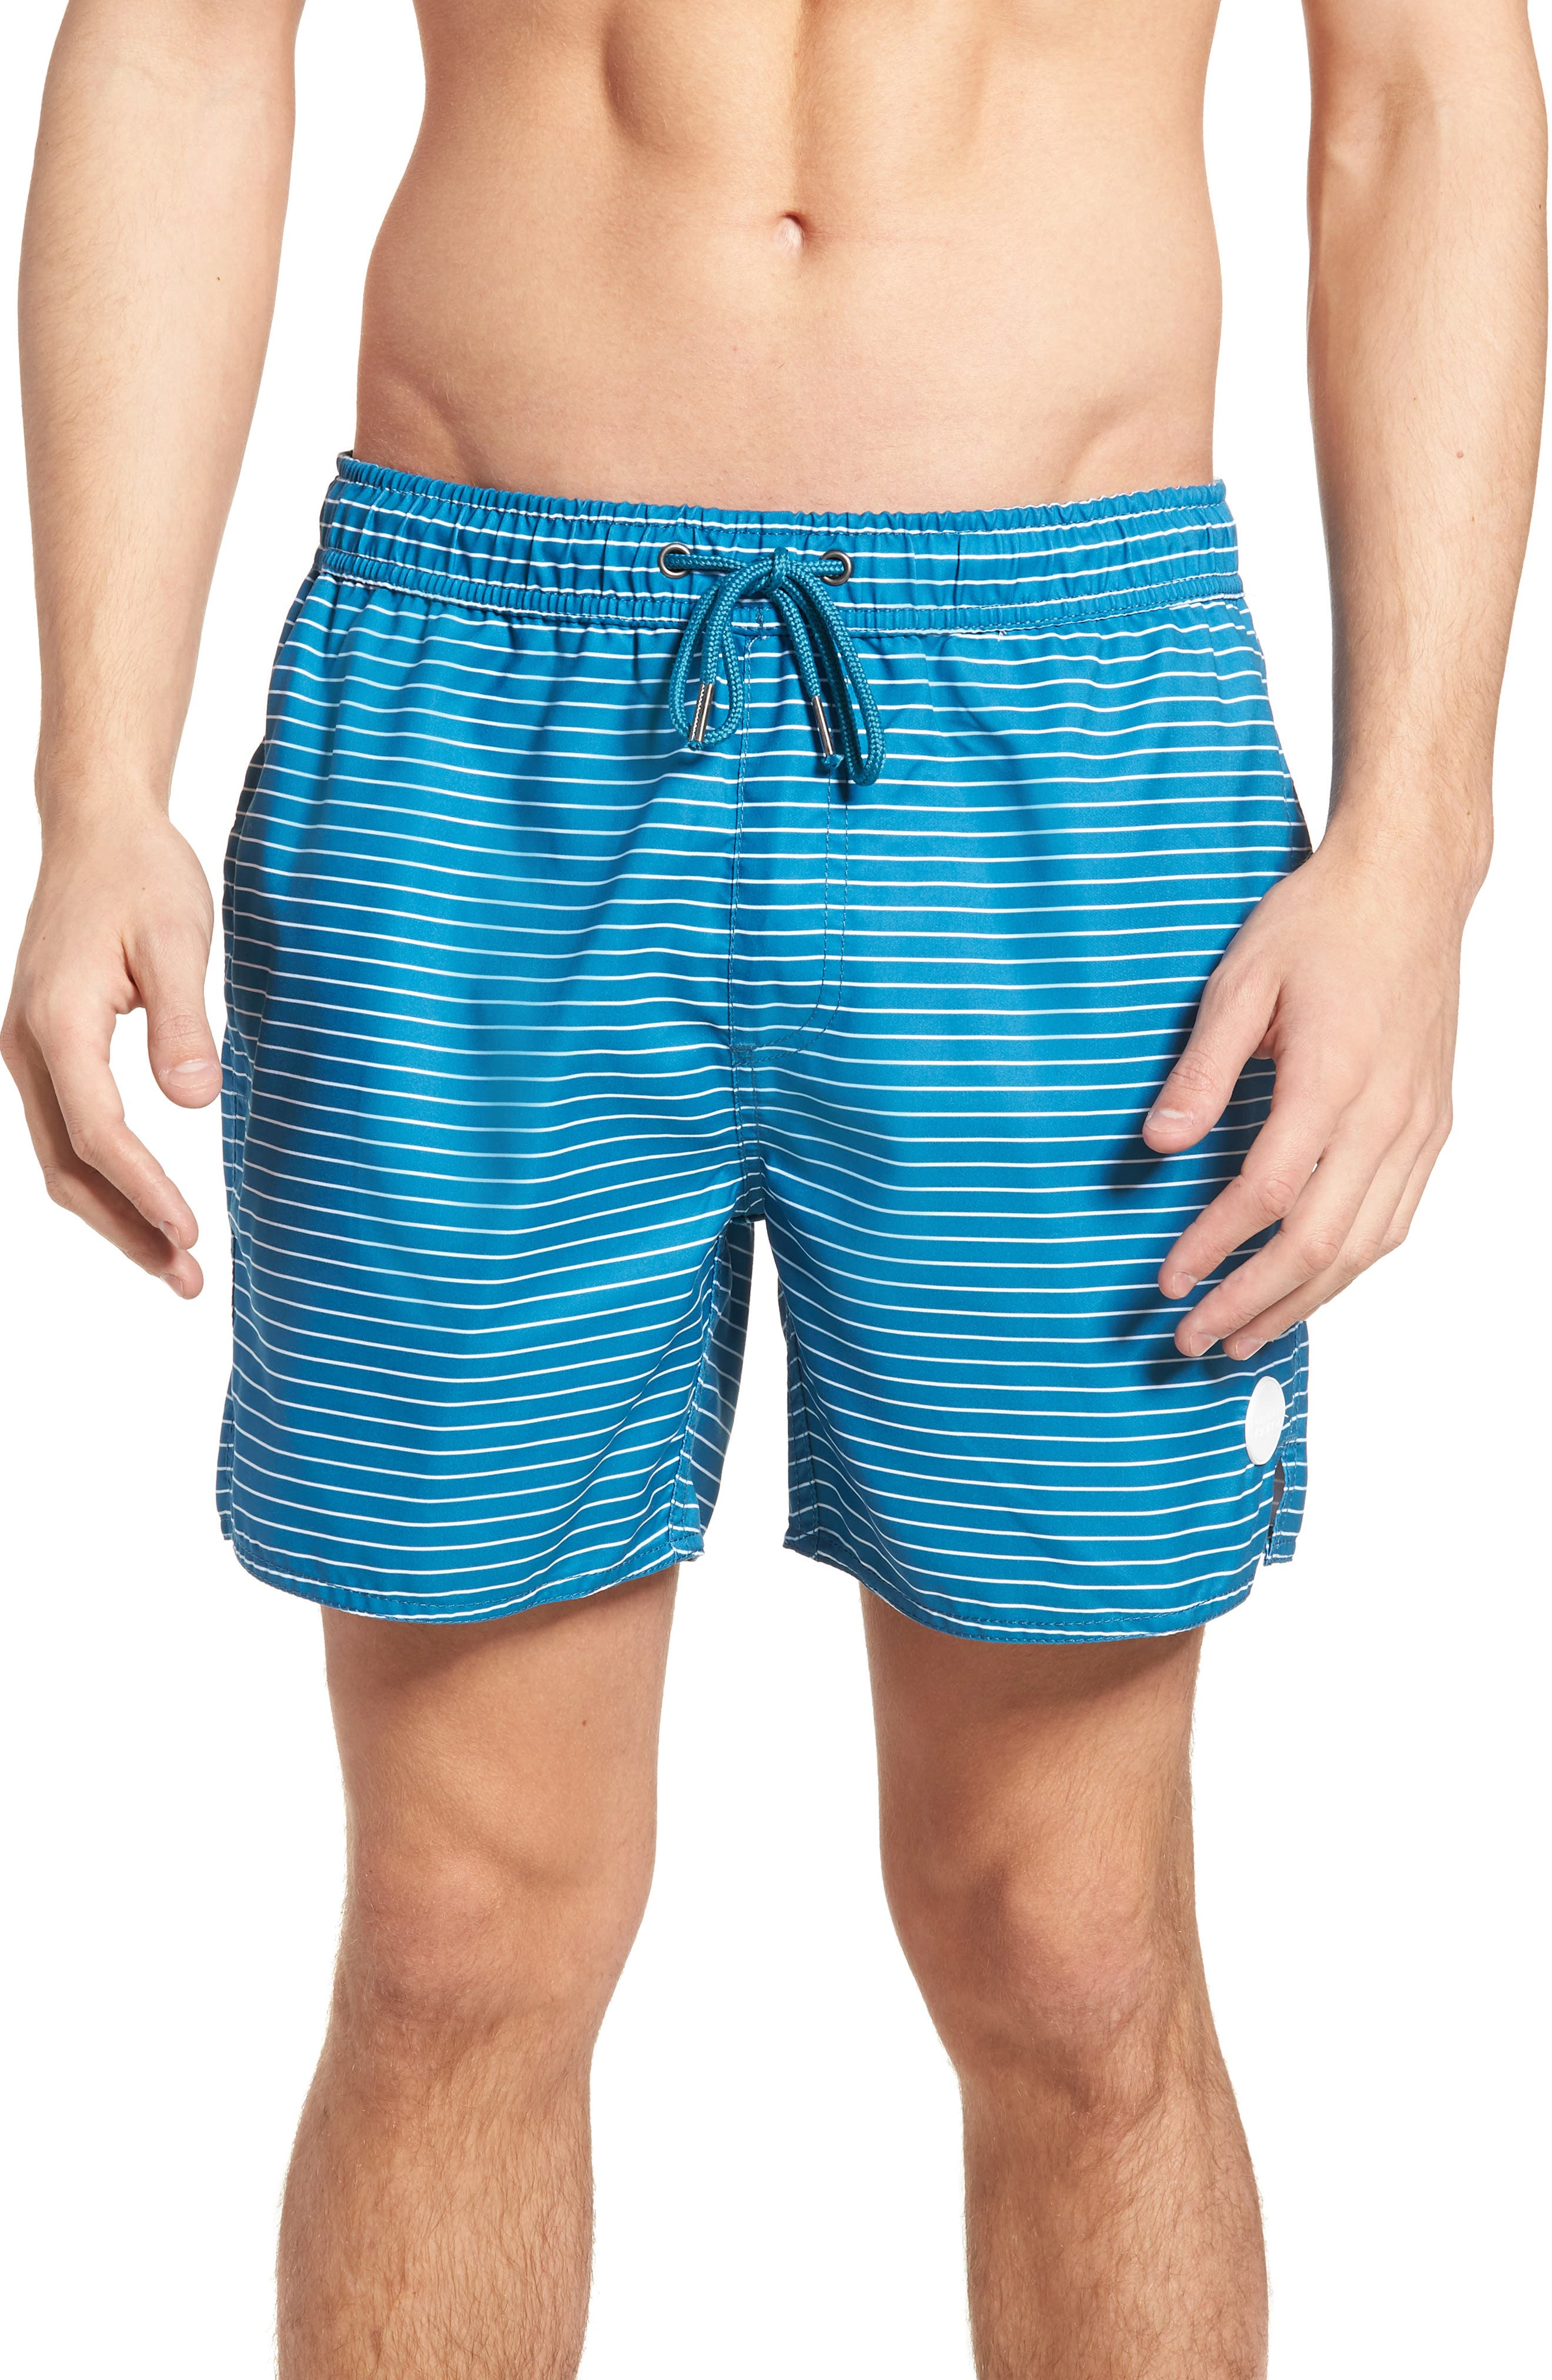 Boost Swim Trunks,                         Main,                         color, Teal